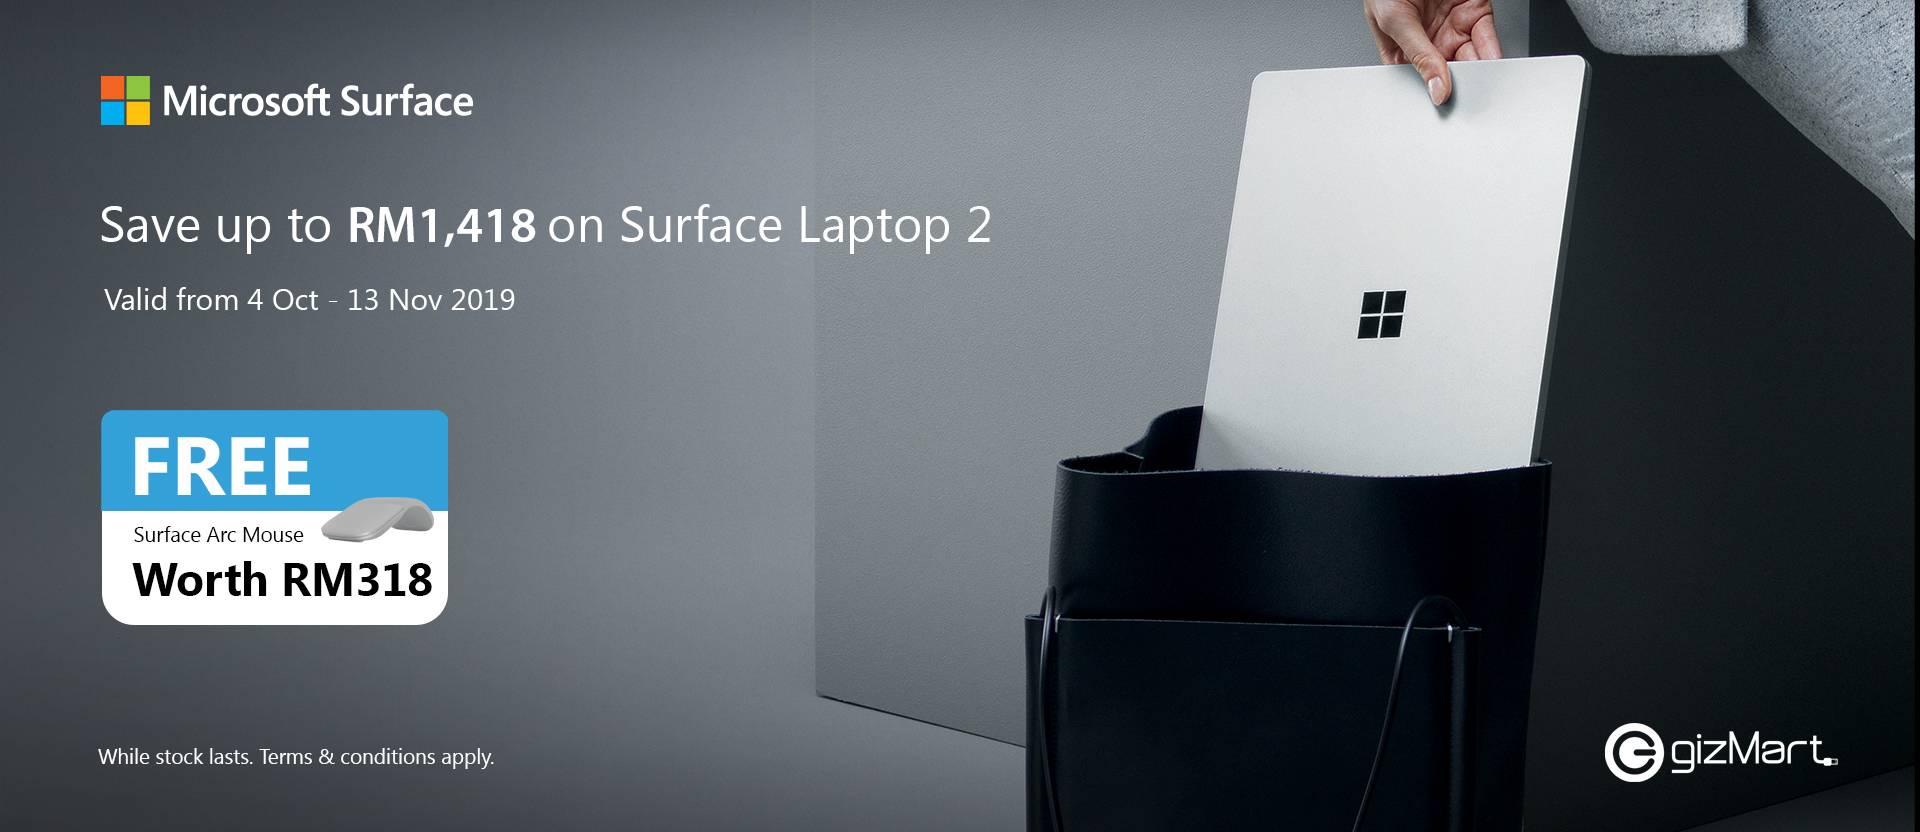 Surface Laptop 4 Oct - 13 Nov